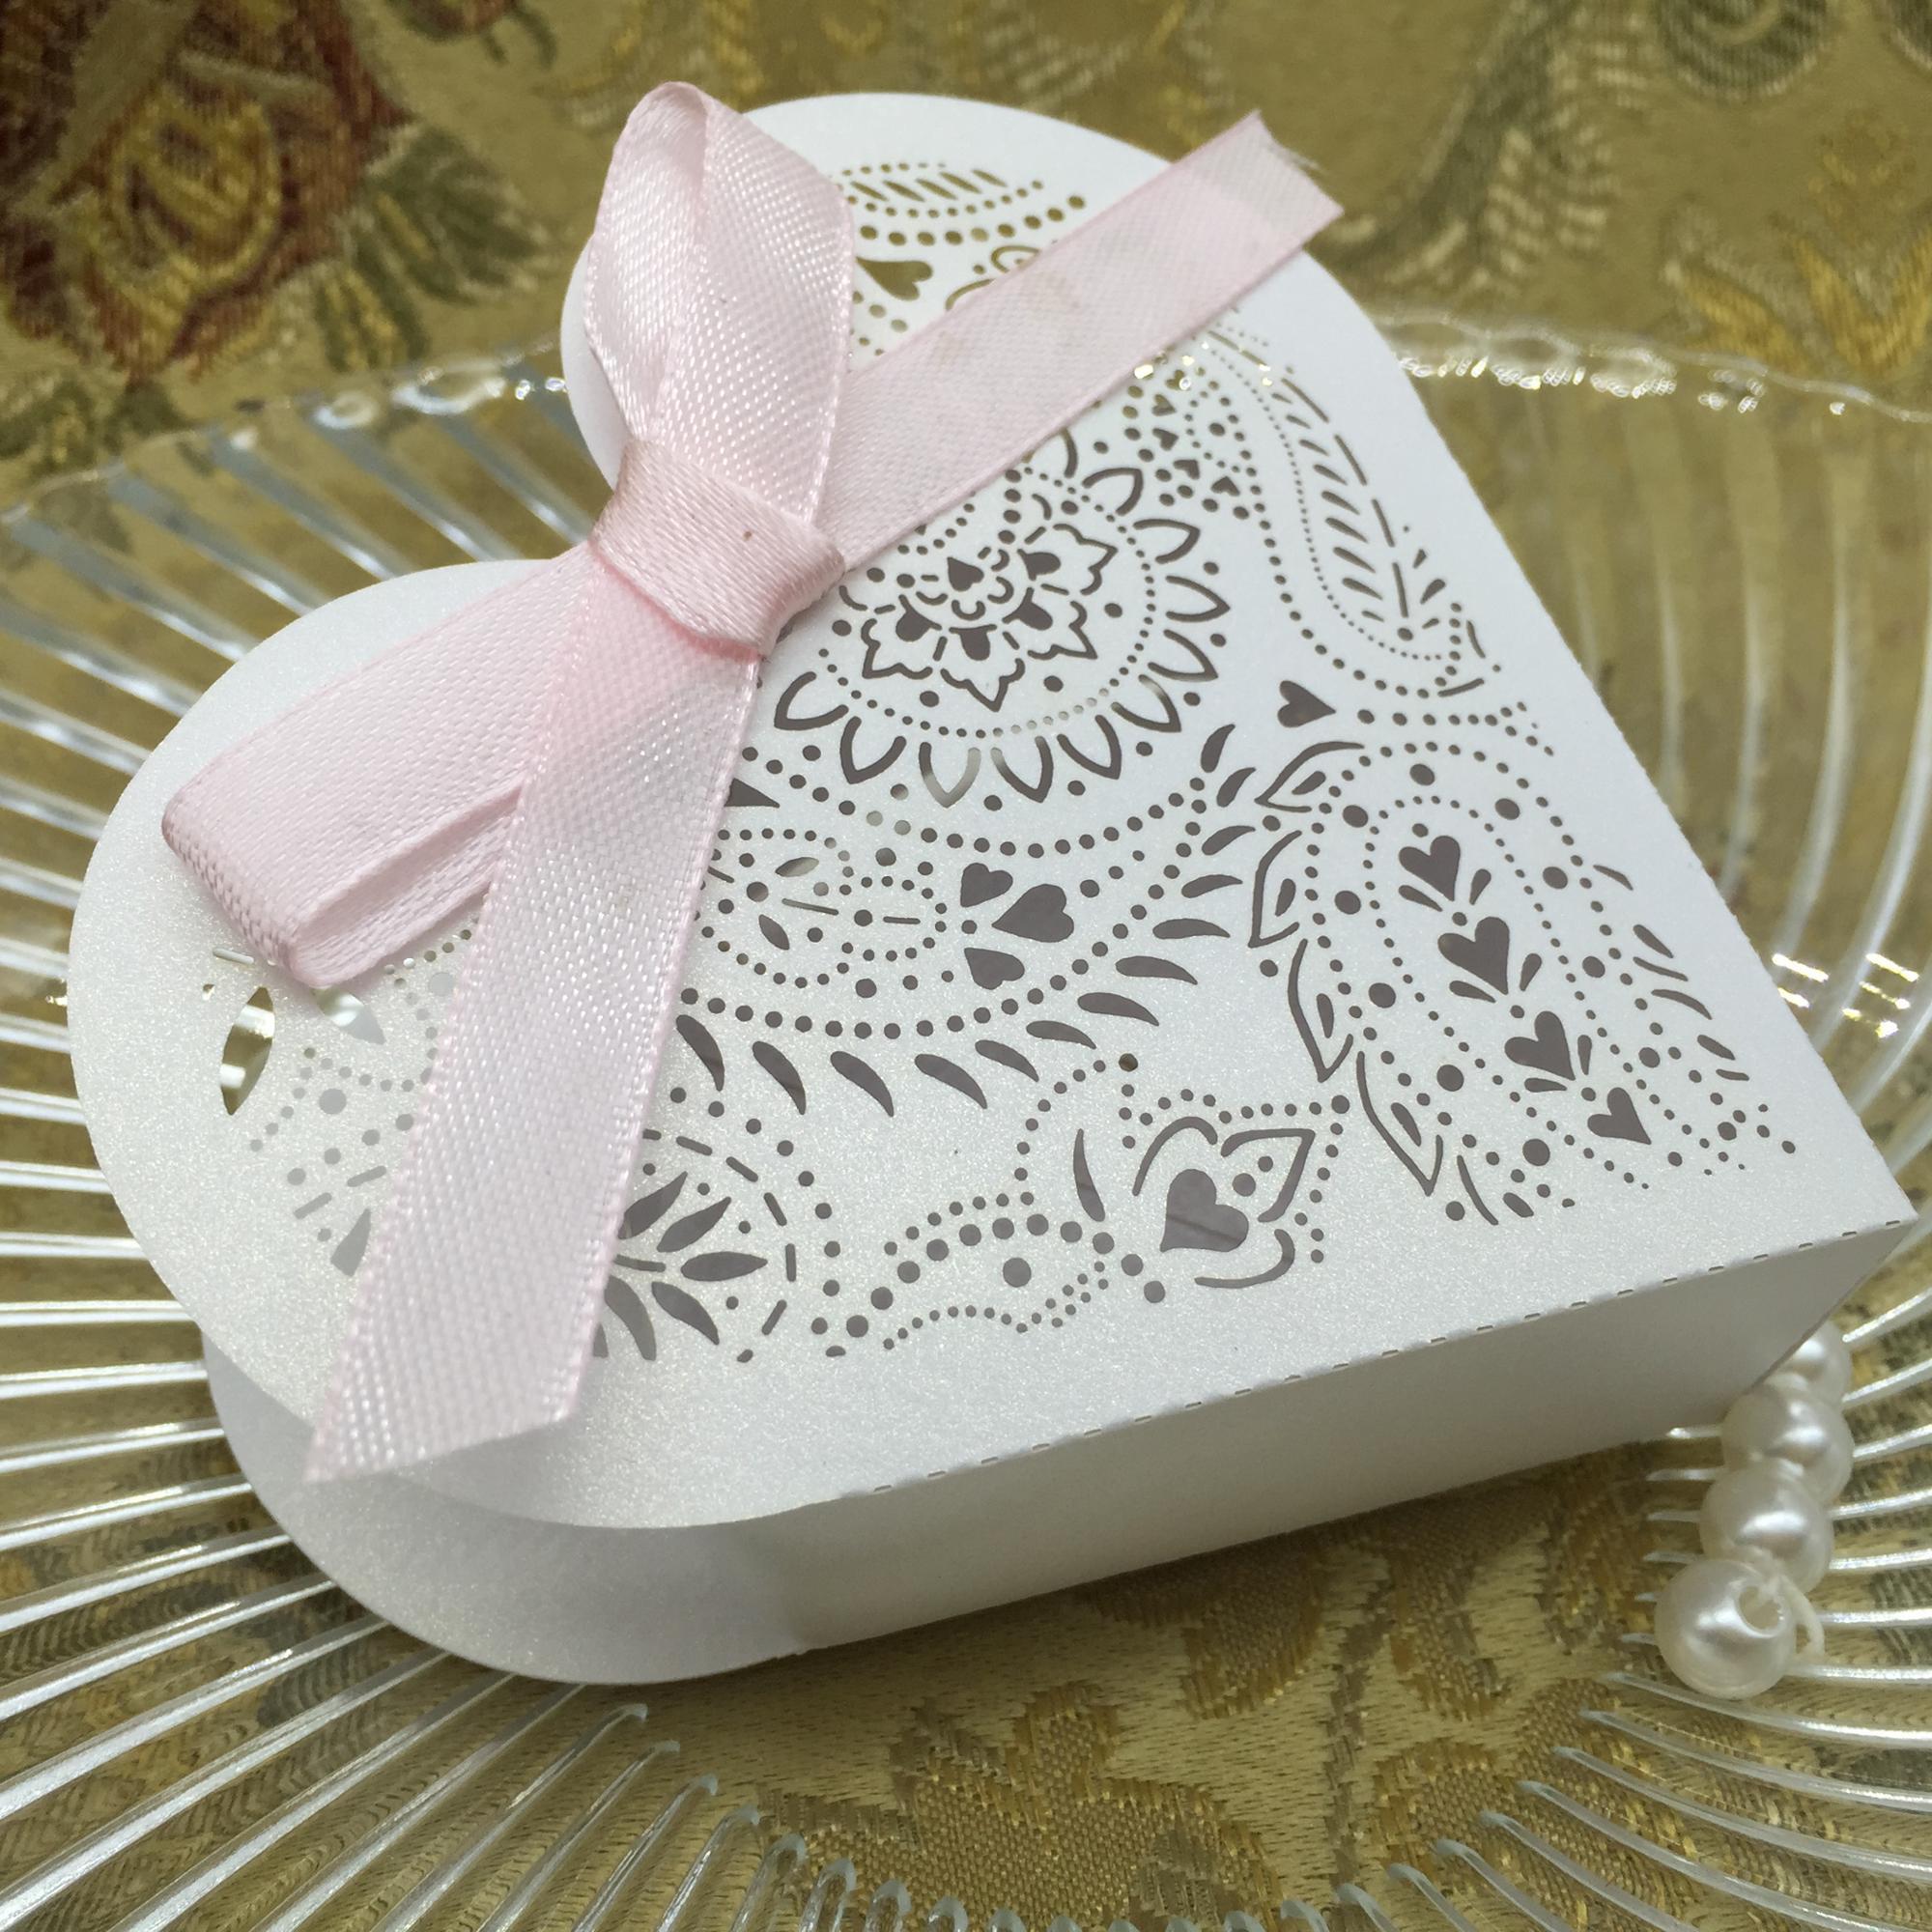 Chinese Supplier Laser Cut Wedding Candy Box Bonbonniere Paper Box ...